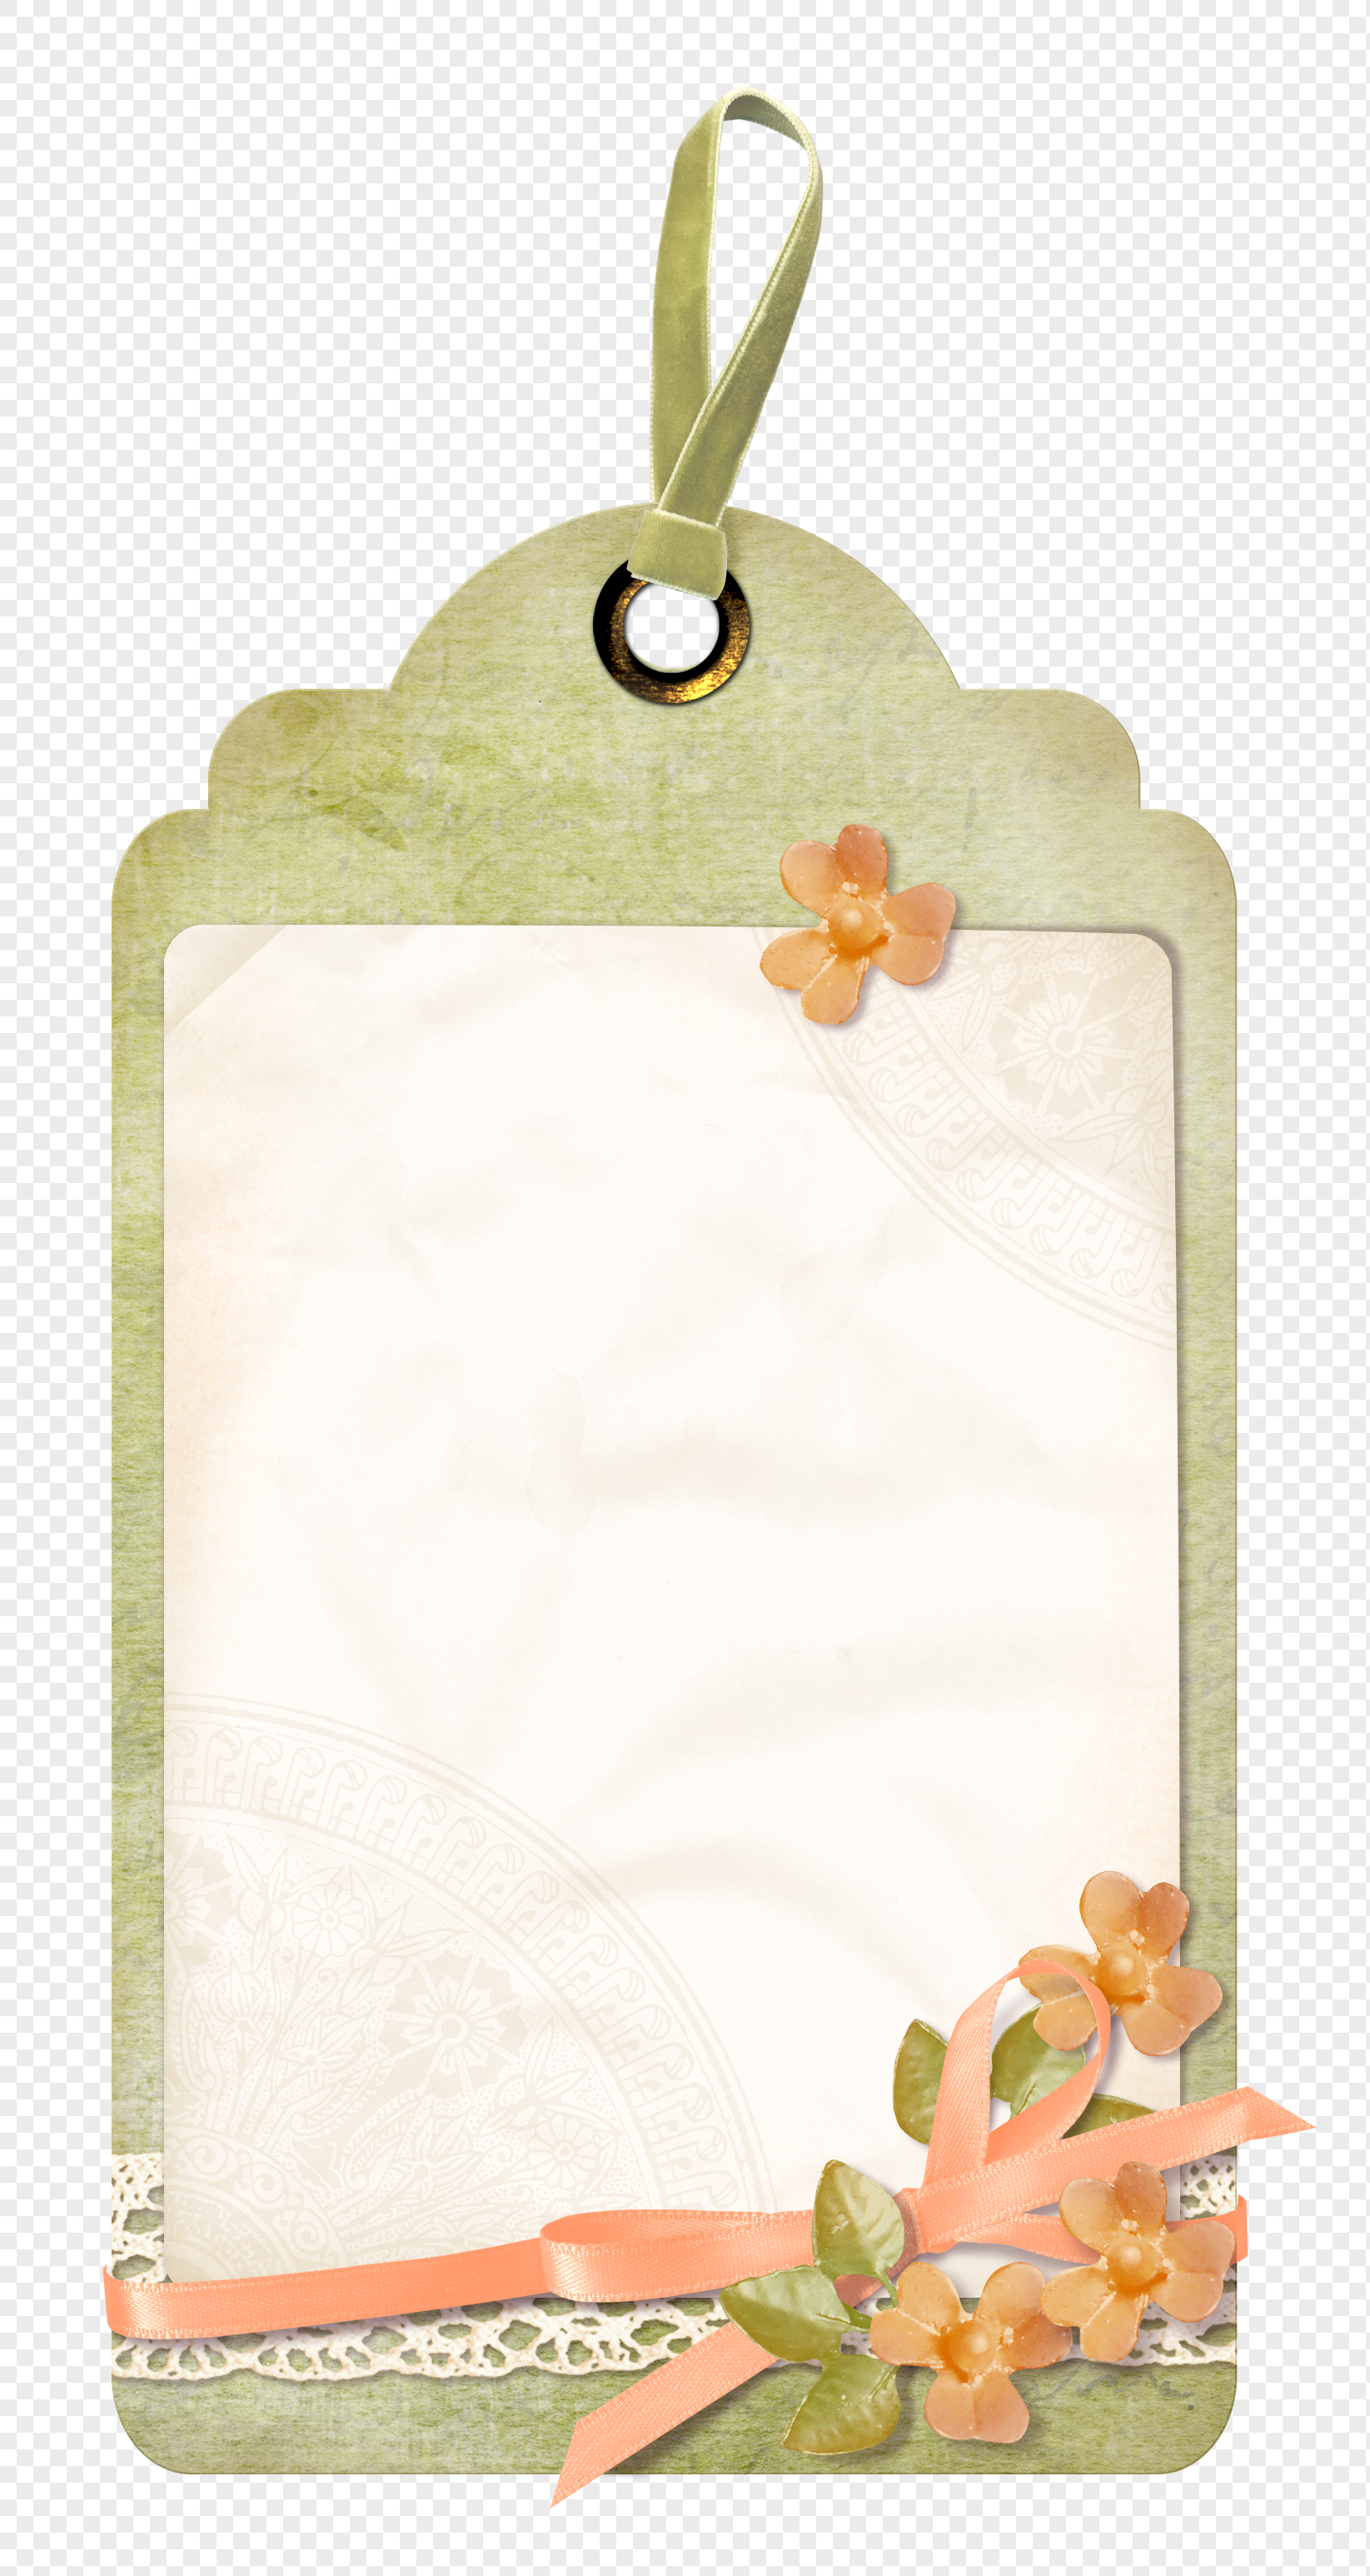 Rectangular And Elegant Hanging Frames Png Image Picture Free